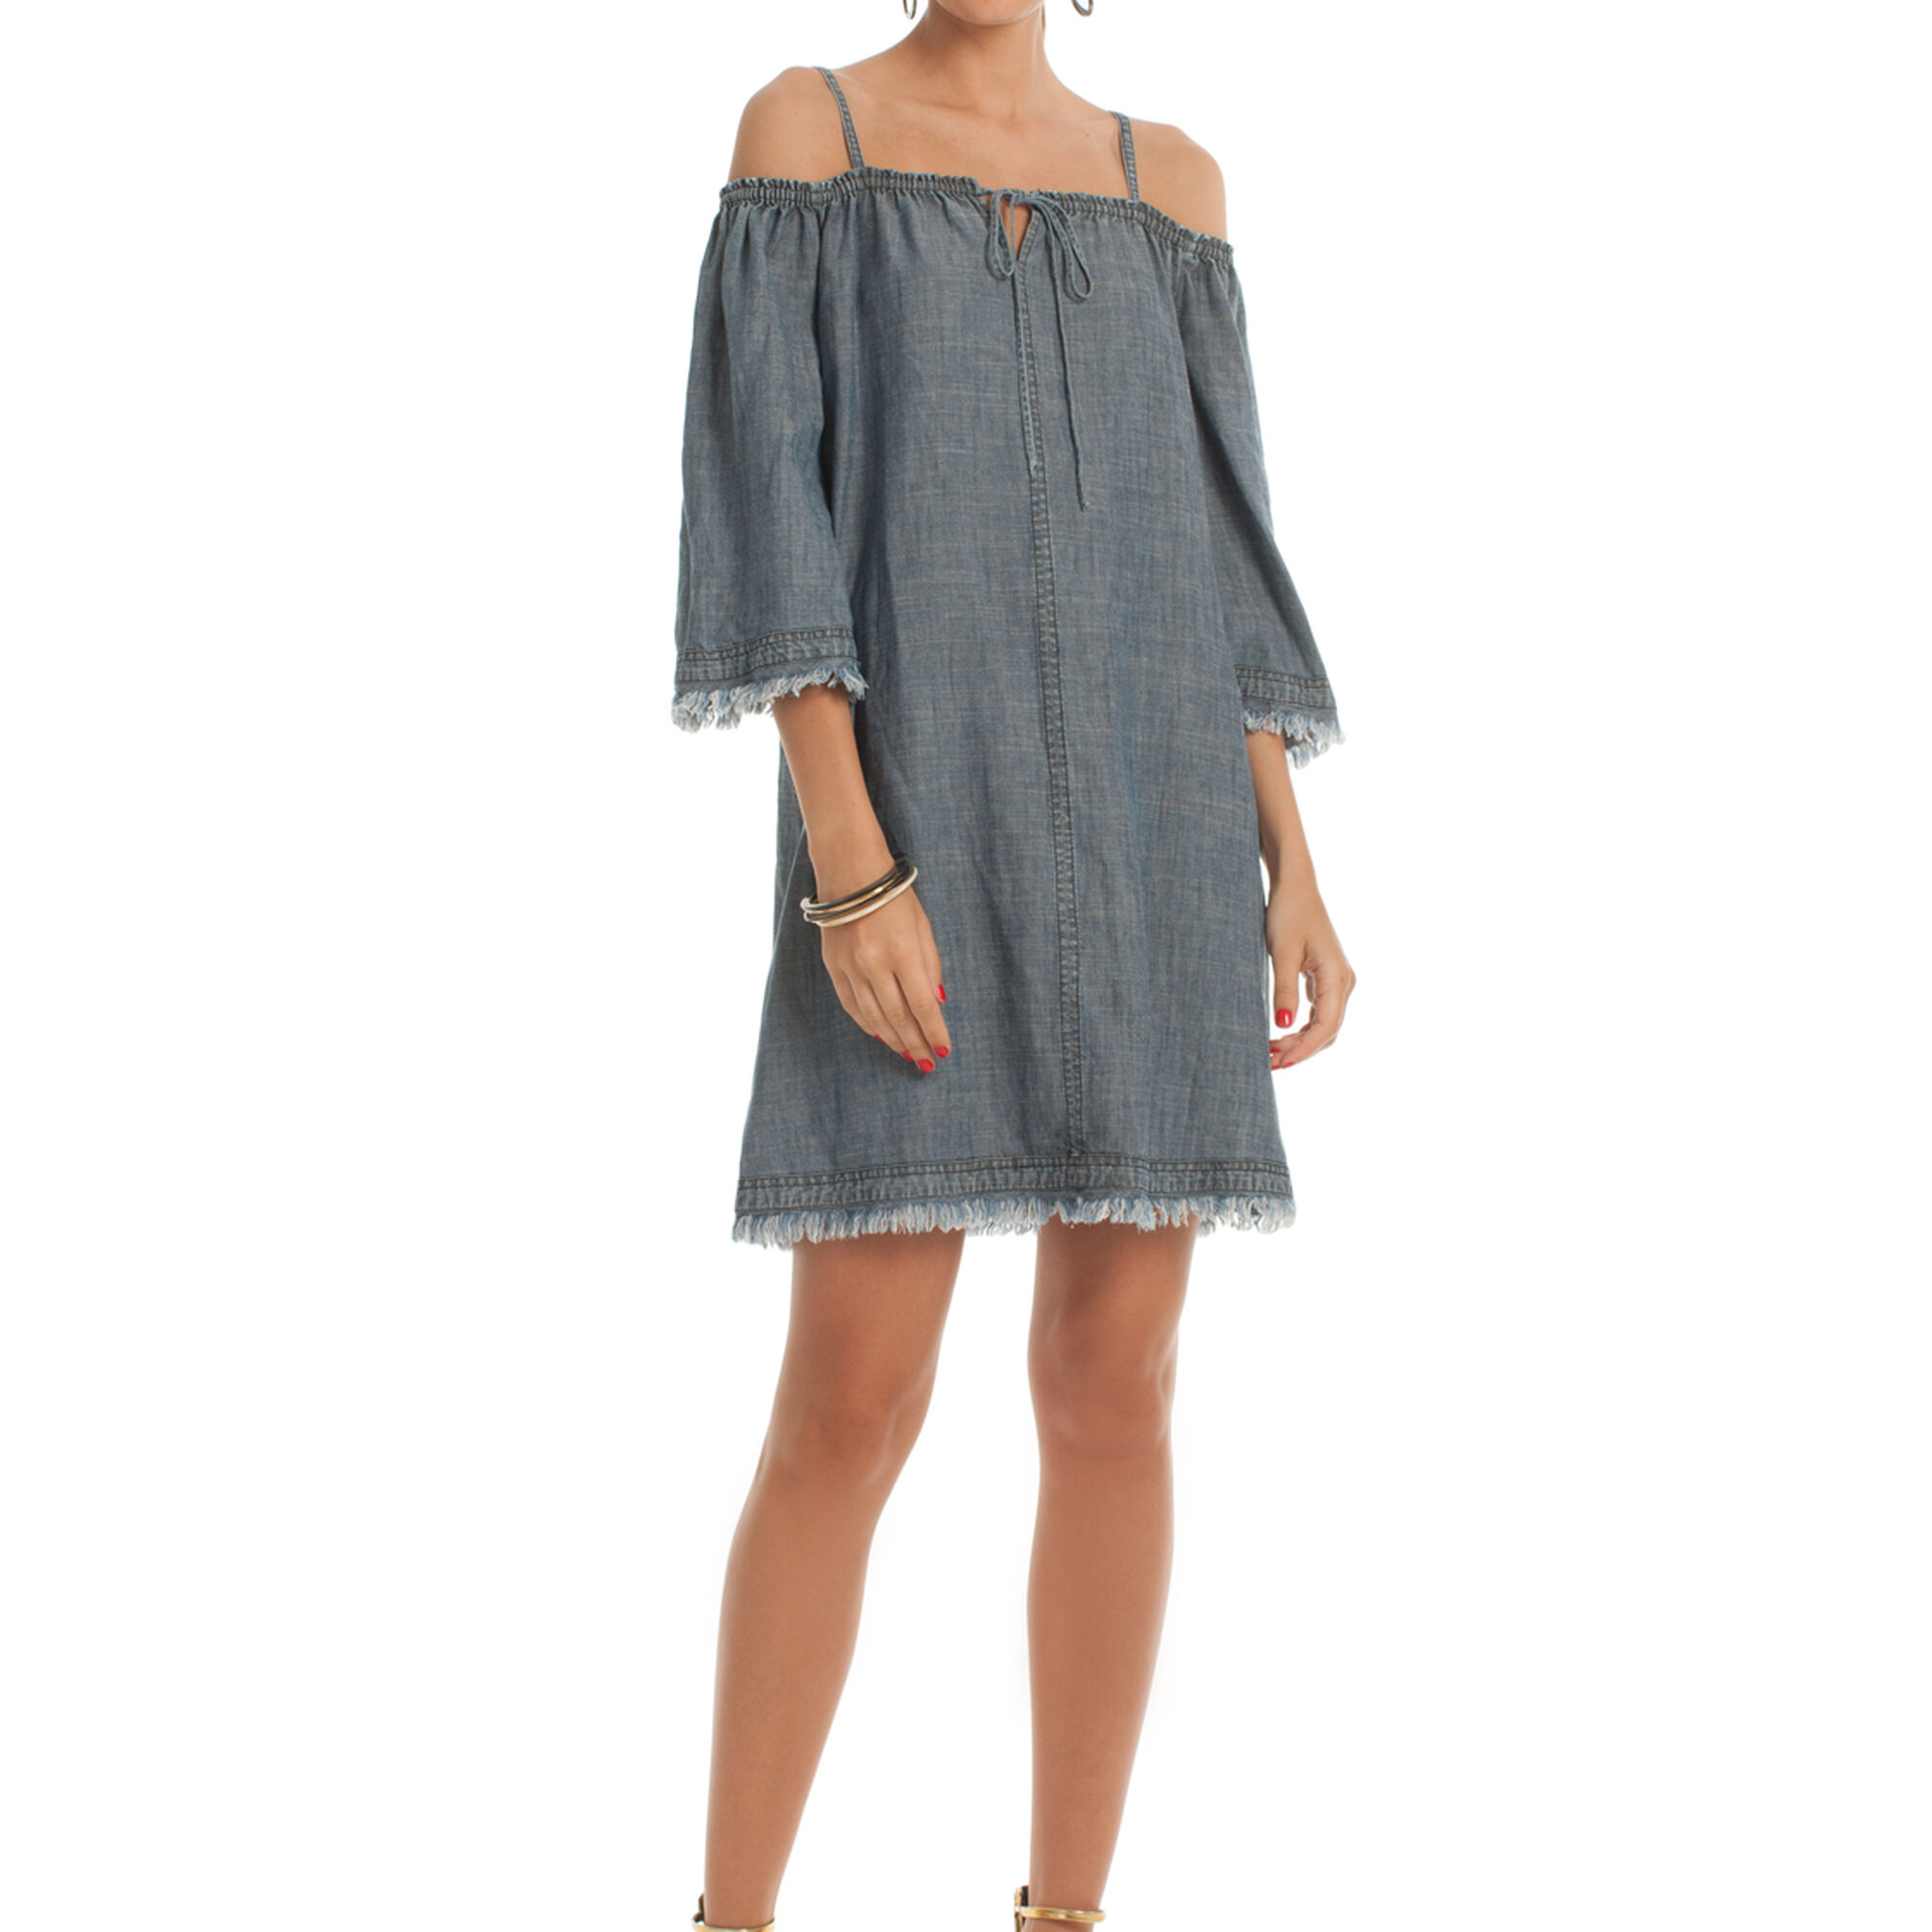 Designer Clothing  Fashion Swimwear By Trina Turk - How to make designer dress at home